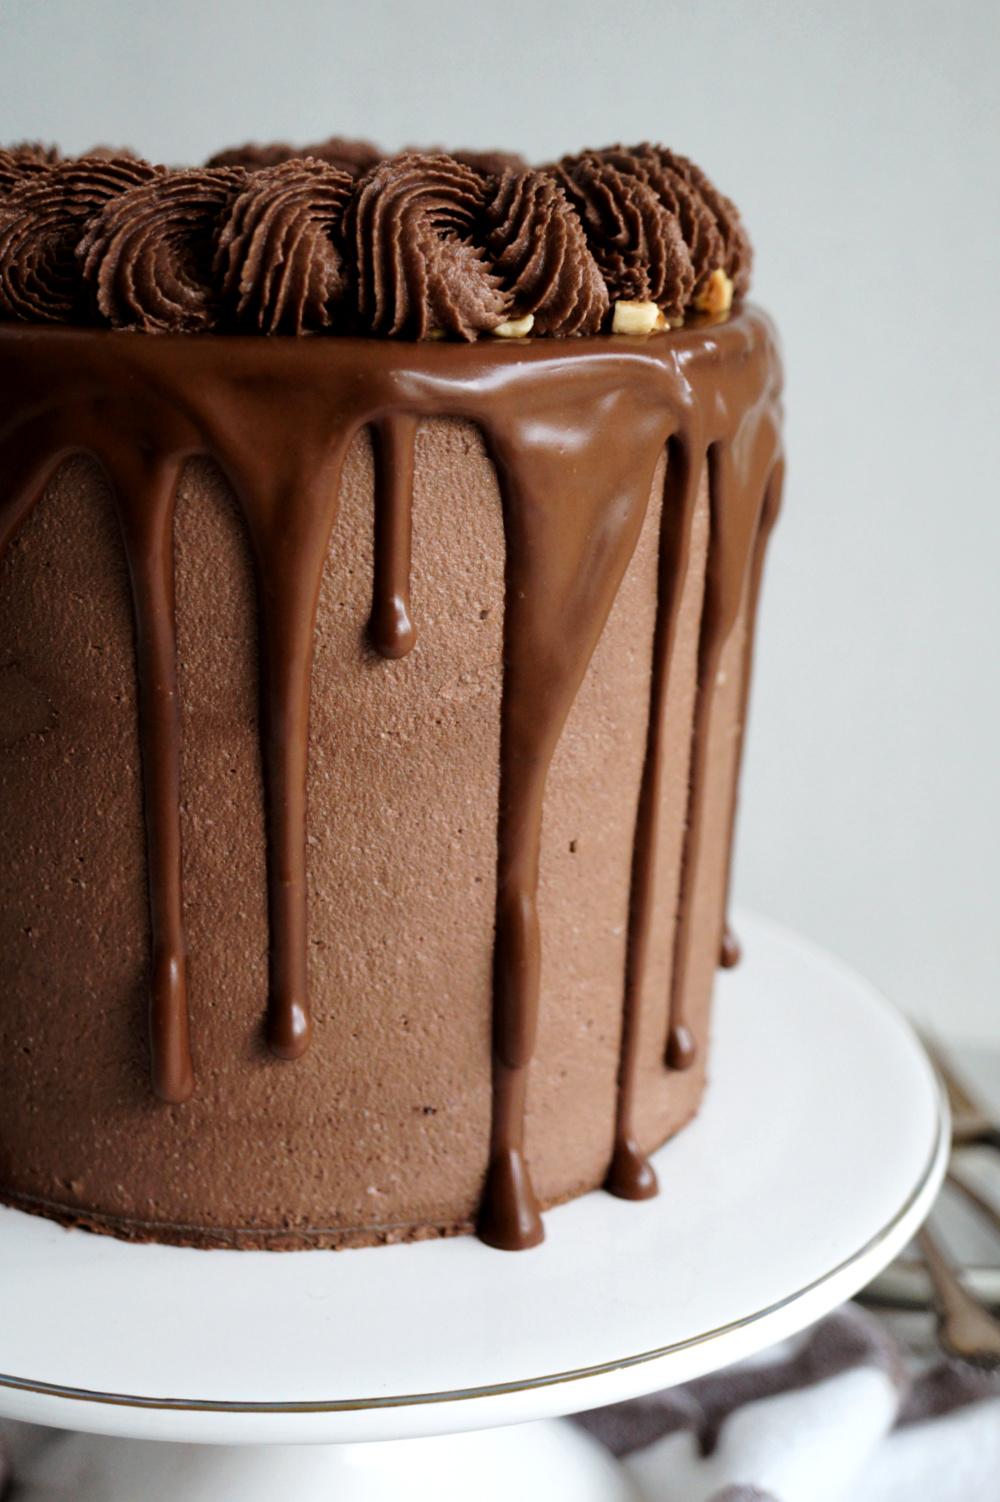 chocolate drip on side of cake